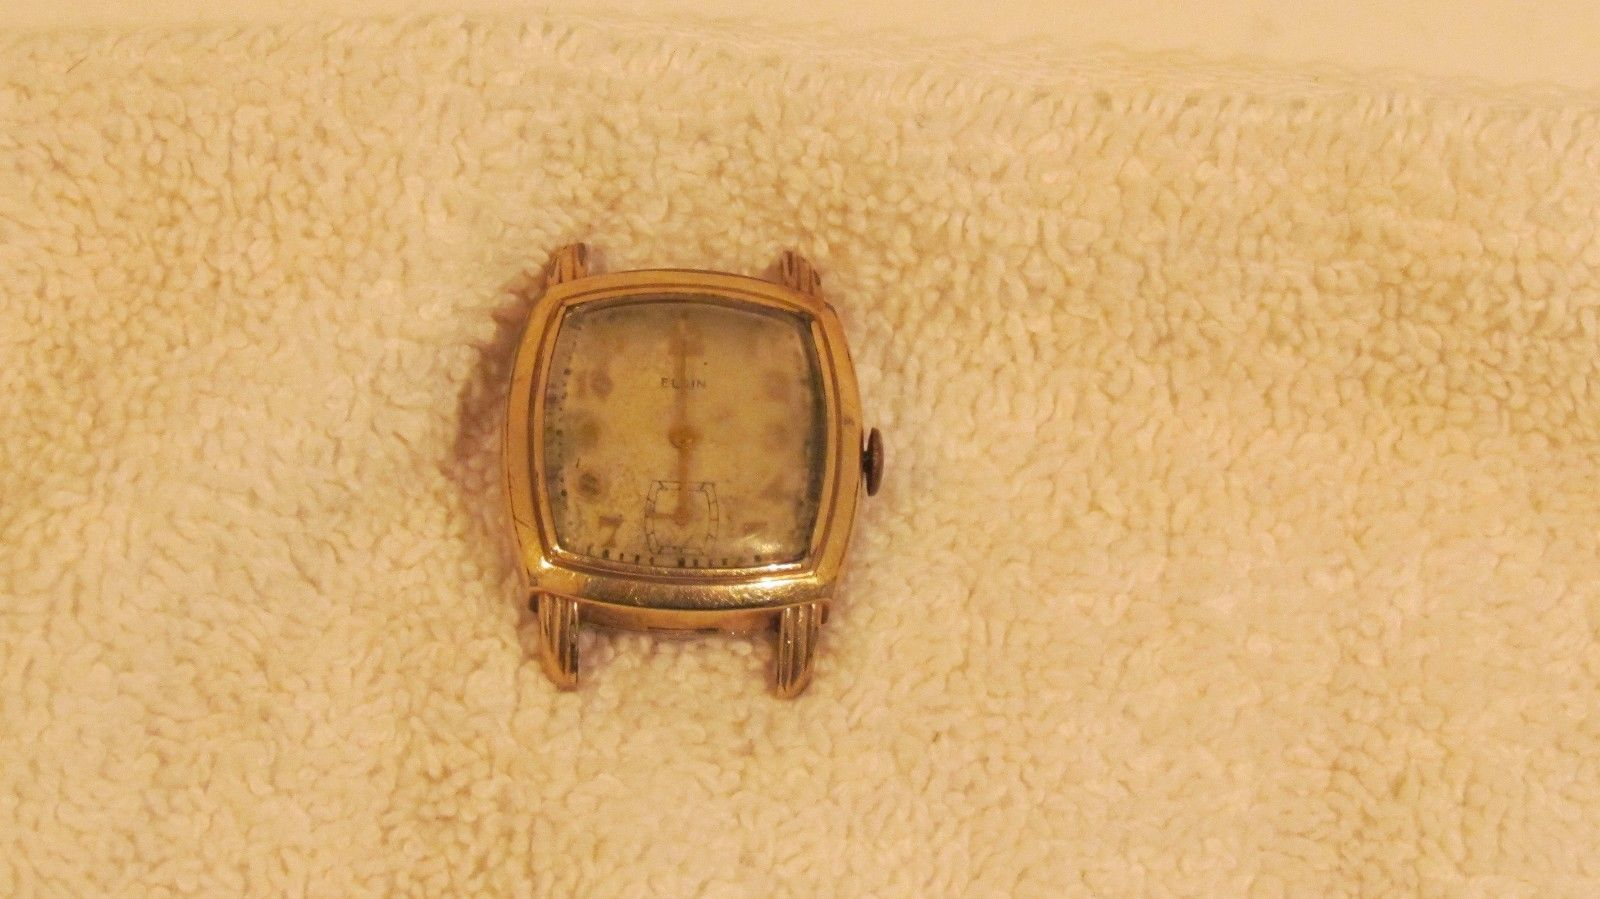 Vintage Elgin DeLuxe 10K Gold Filled Winding Second Dial Watch - needs refurbish